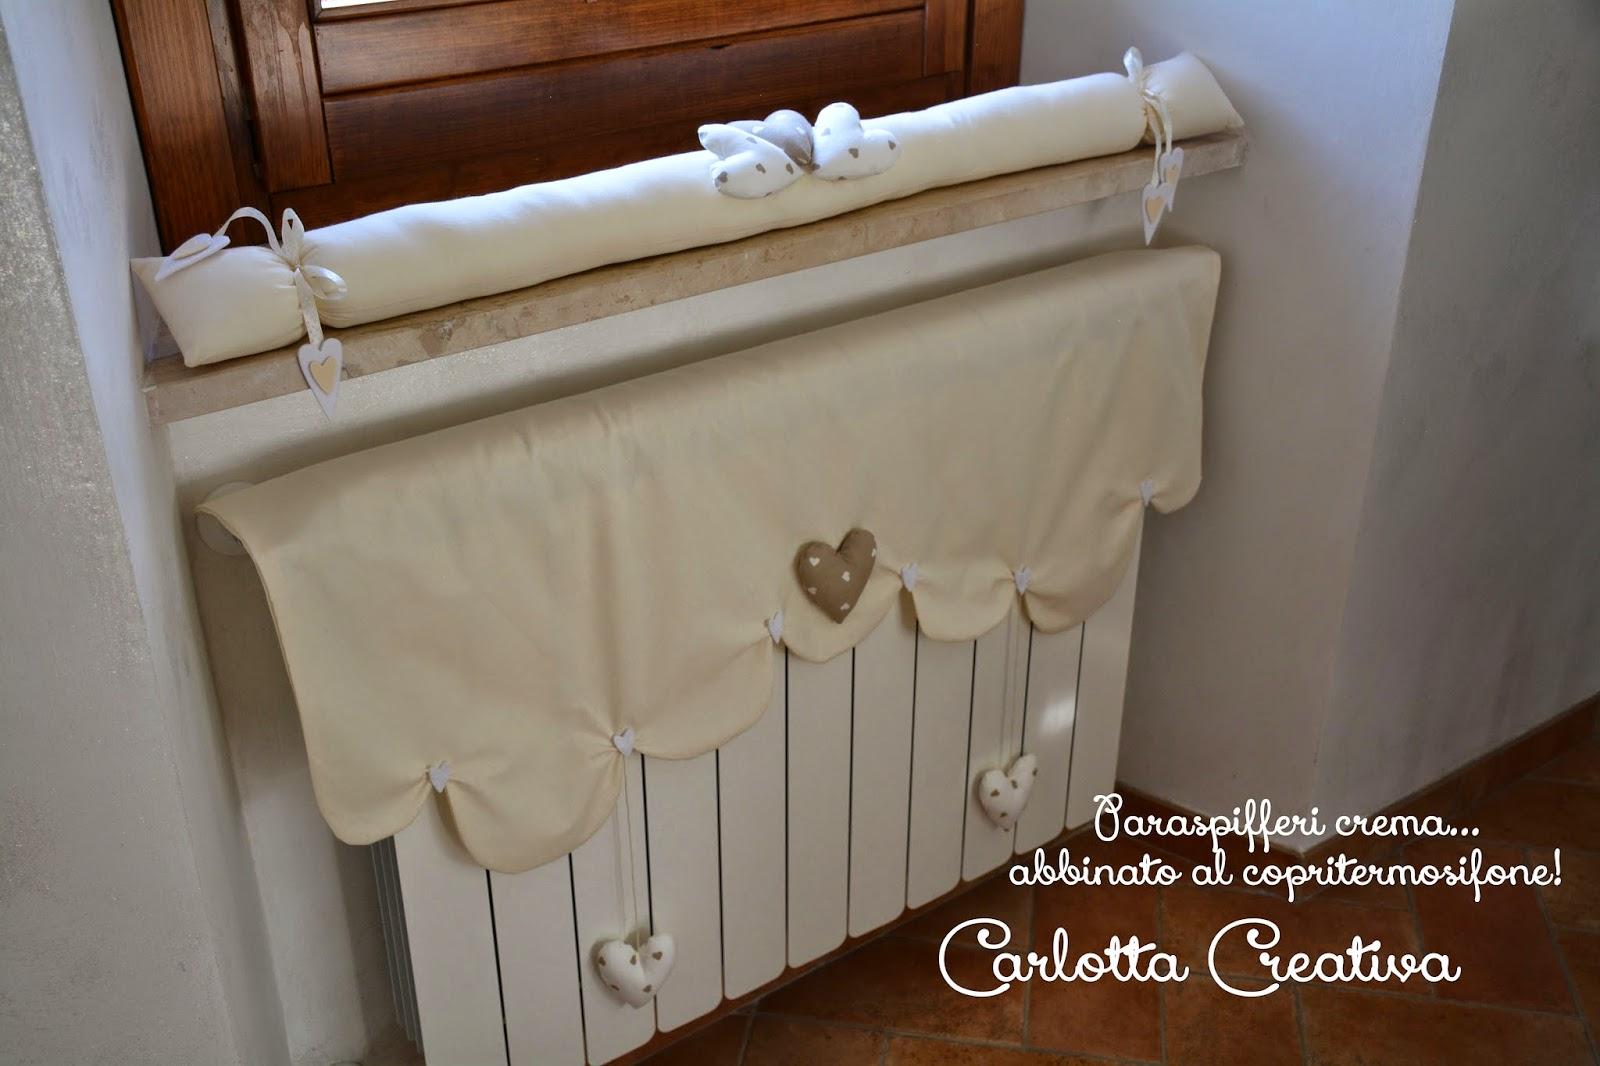 Carlotta creativa - Paraspifferi per finestre ...